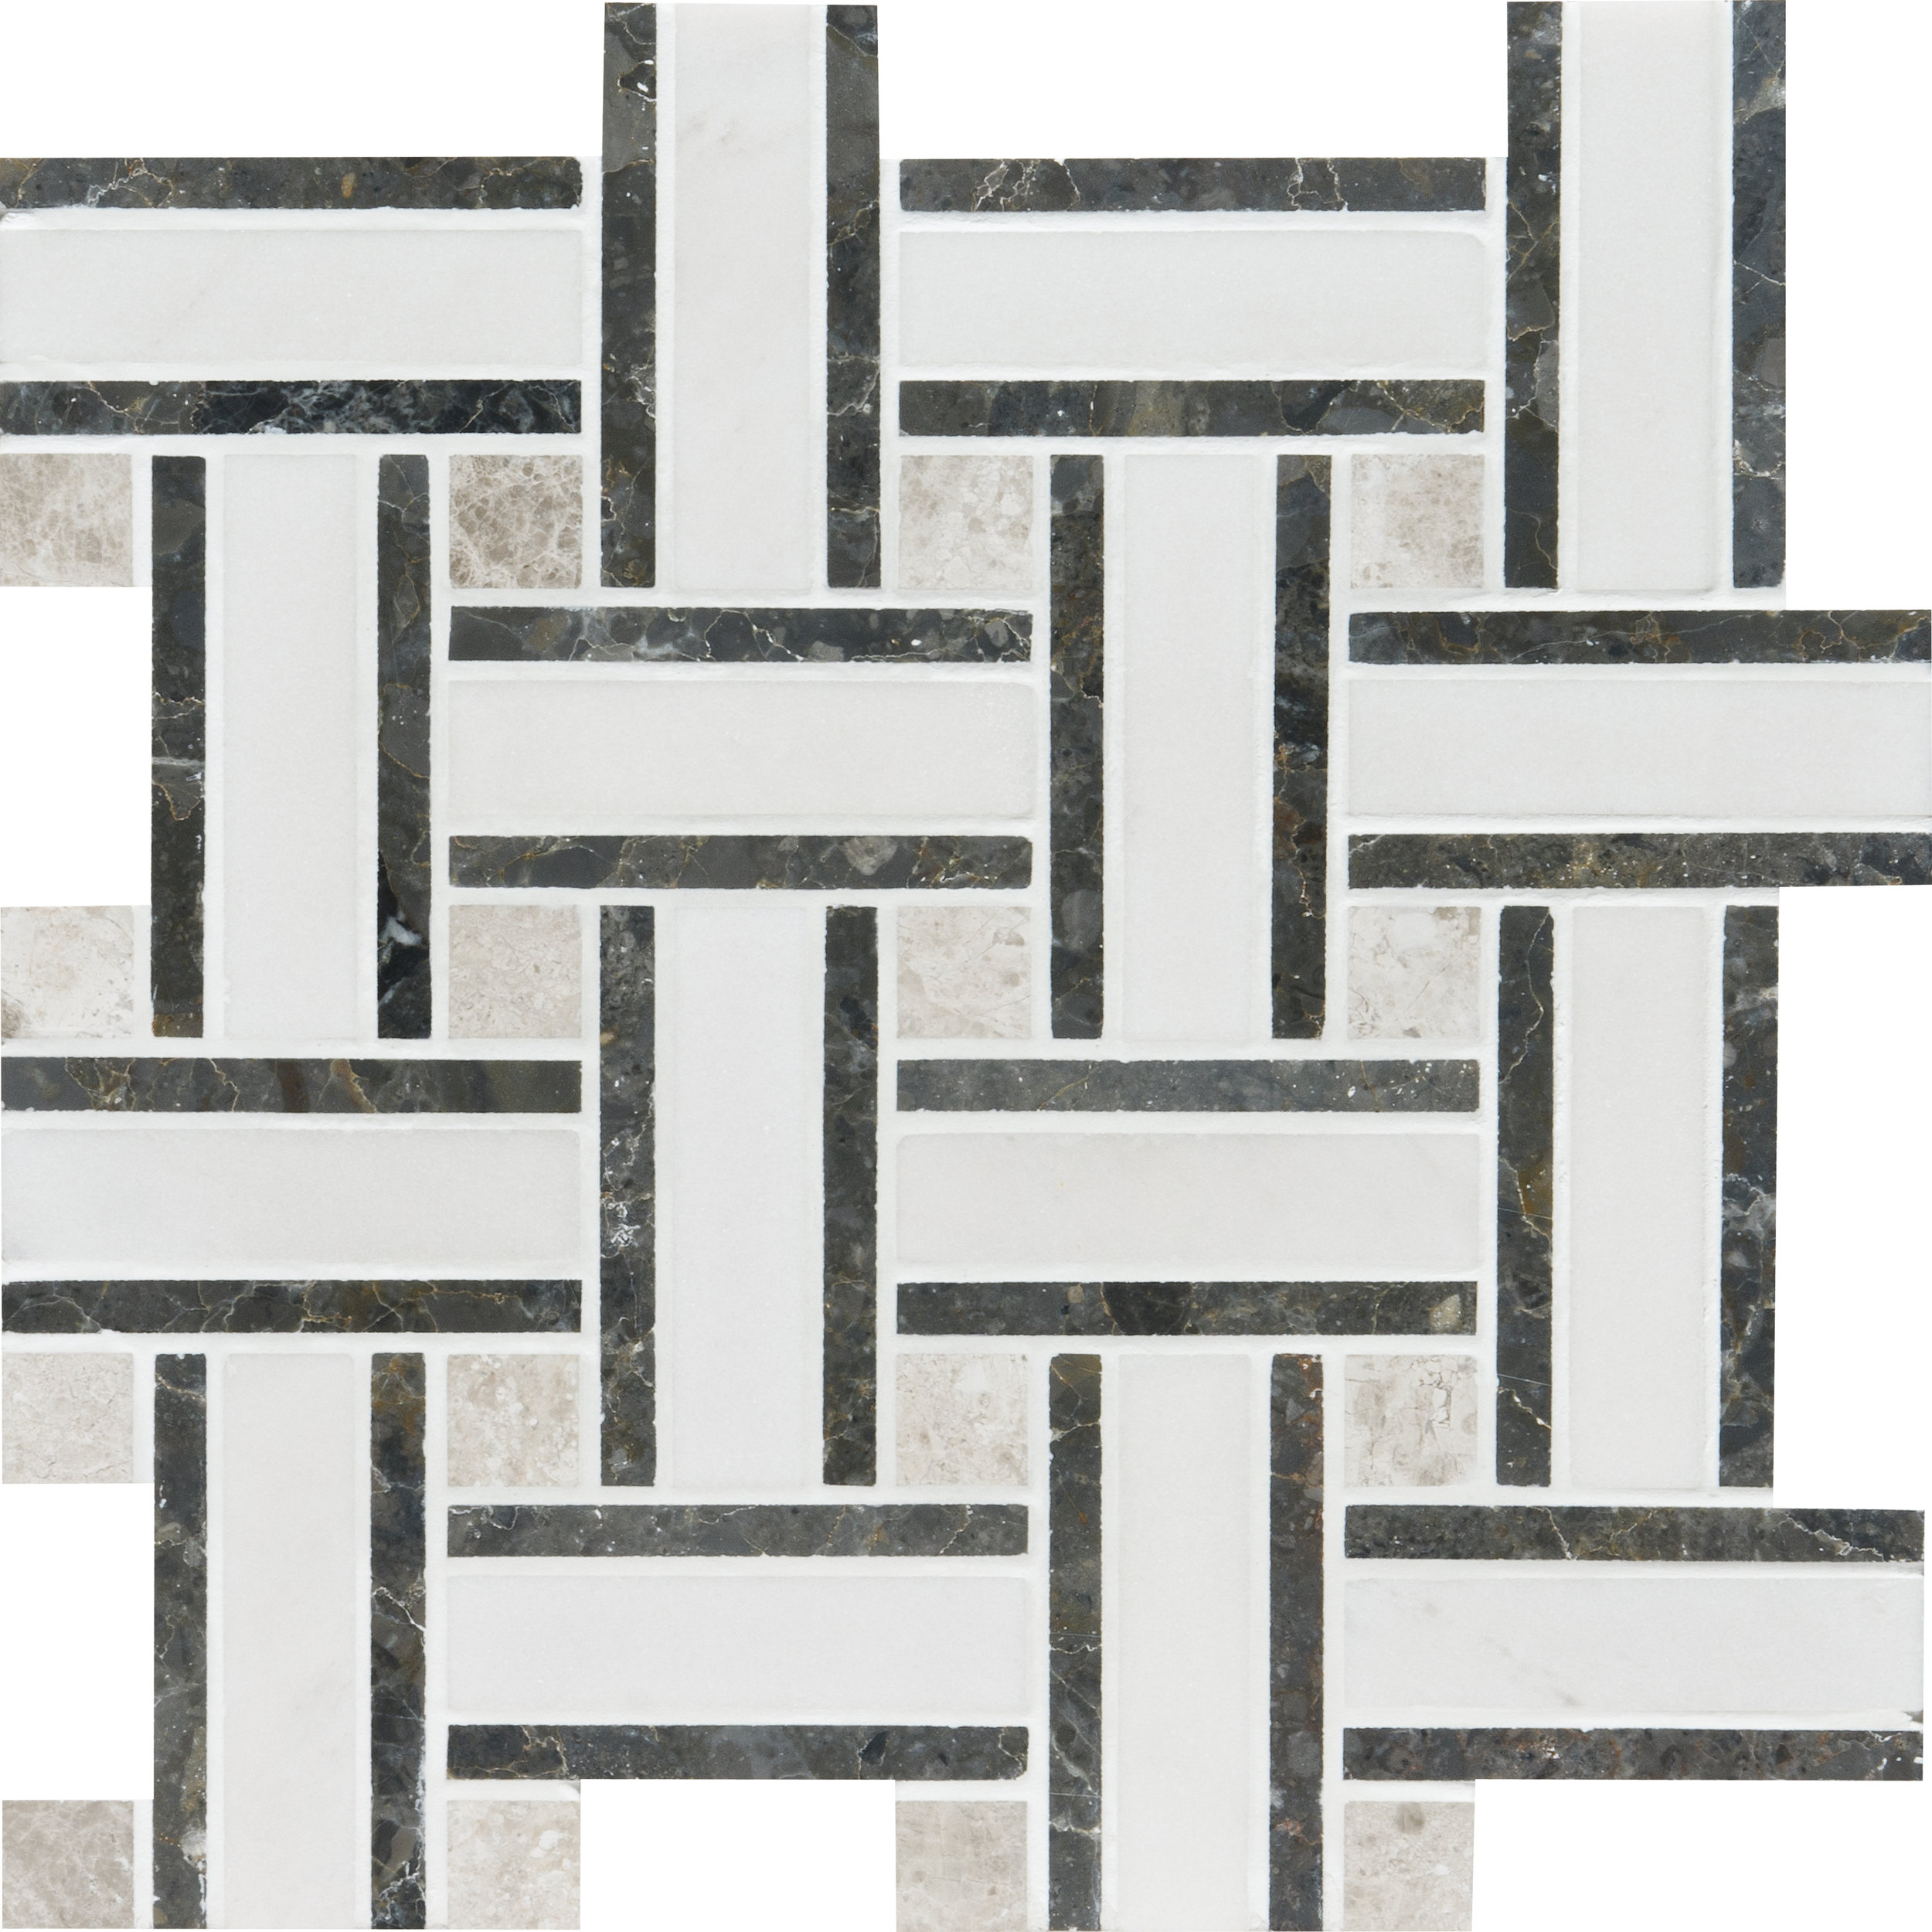 "MS01332 aspen white honed lattice mosaic 12""x12""x3/8"" sheets"